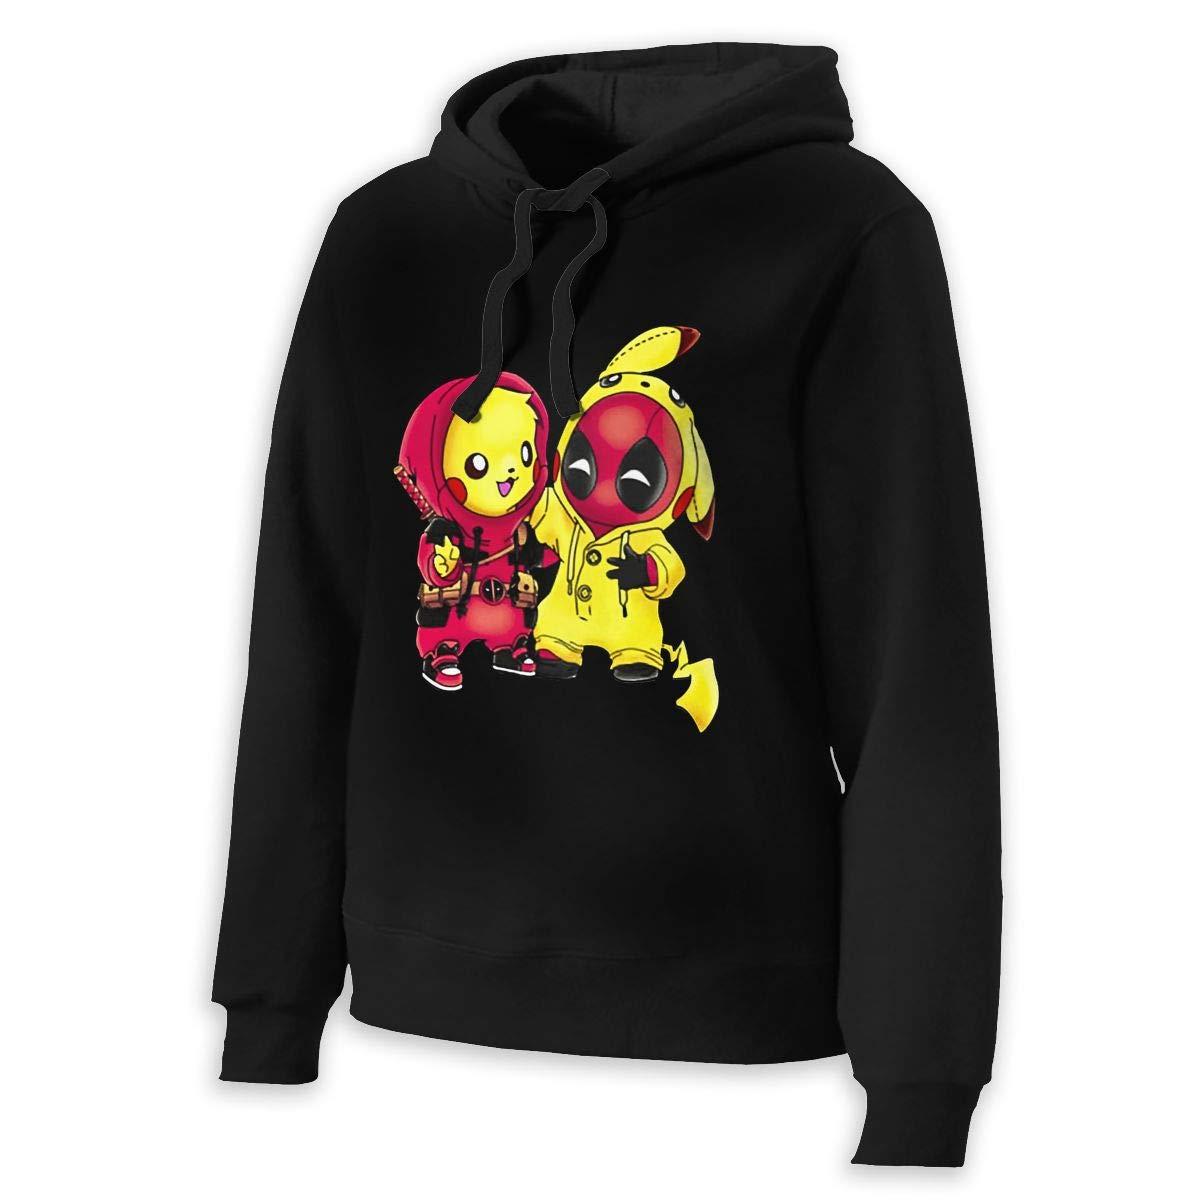 Pikachu Pool Ninja T Shirt, Pikachu Deadpool Woman Hoodie ...